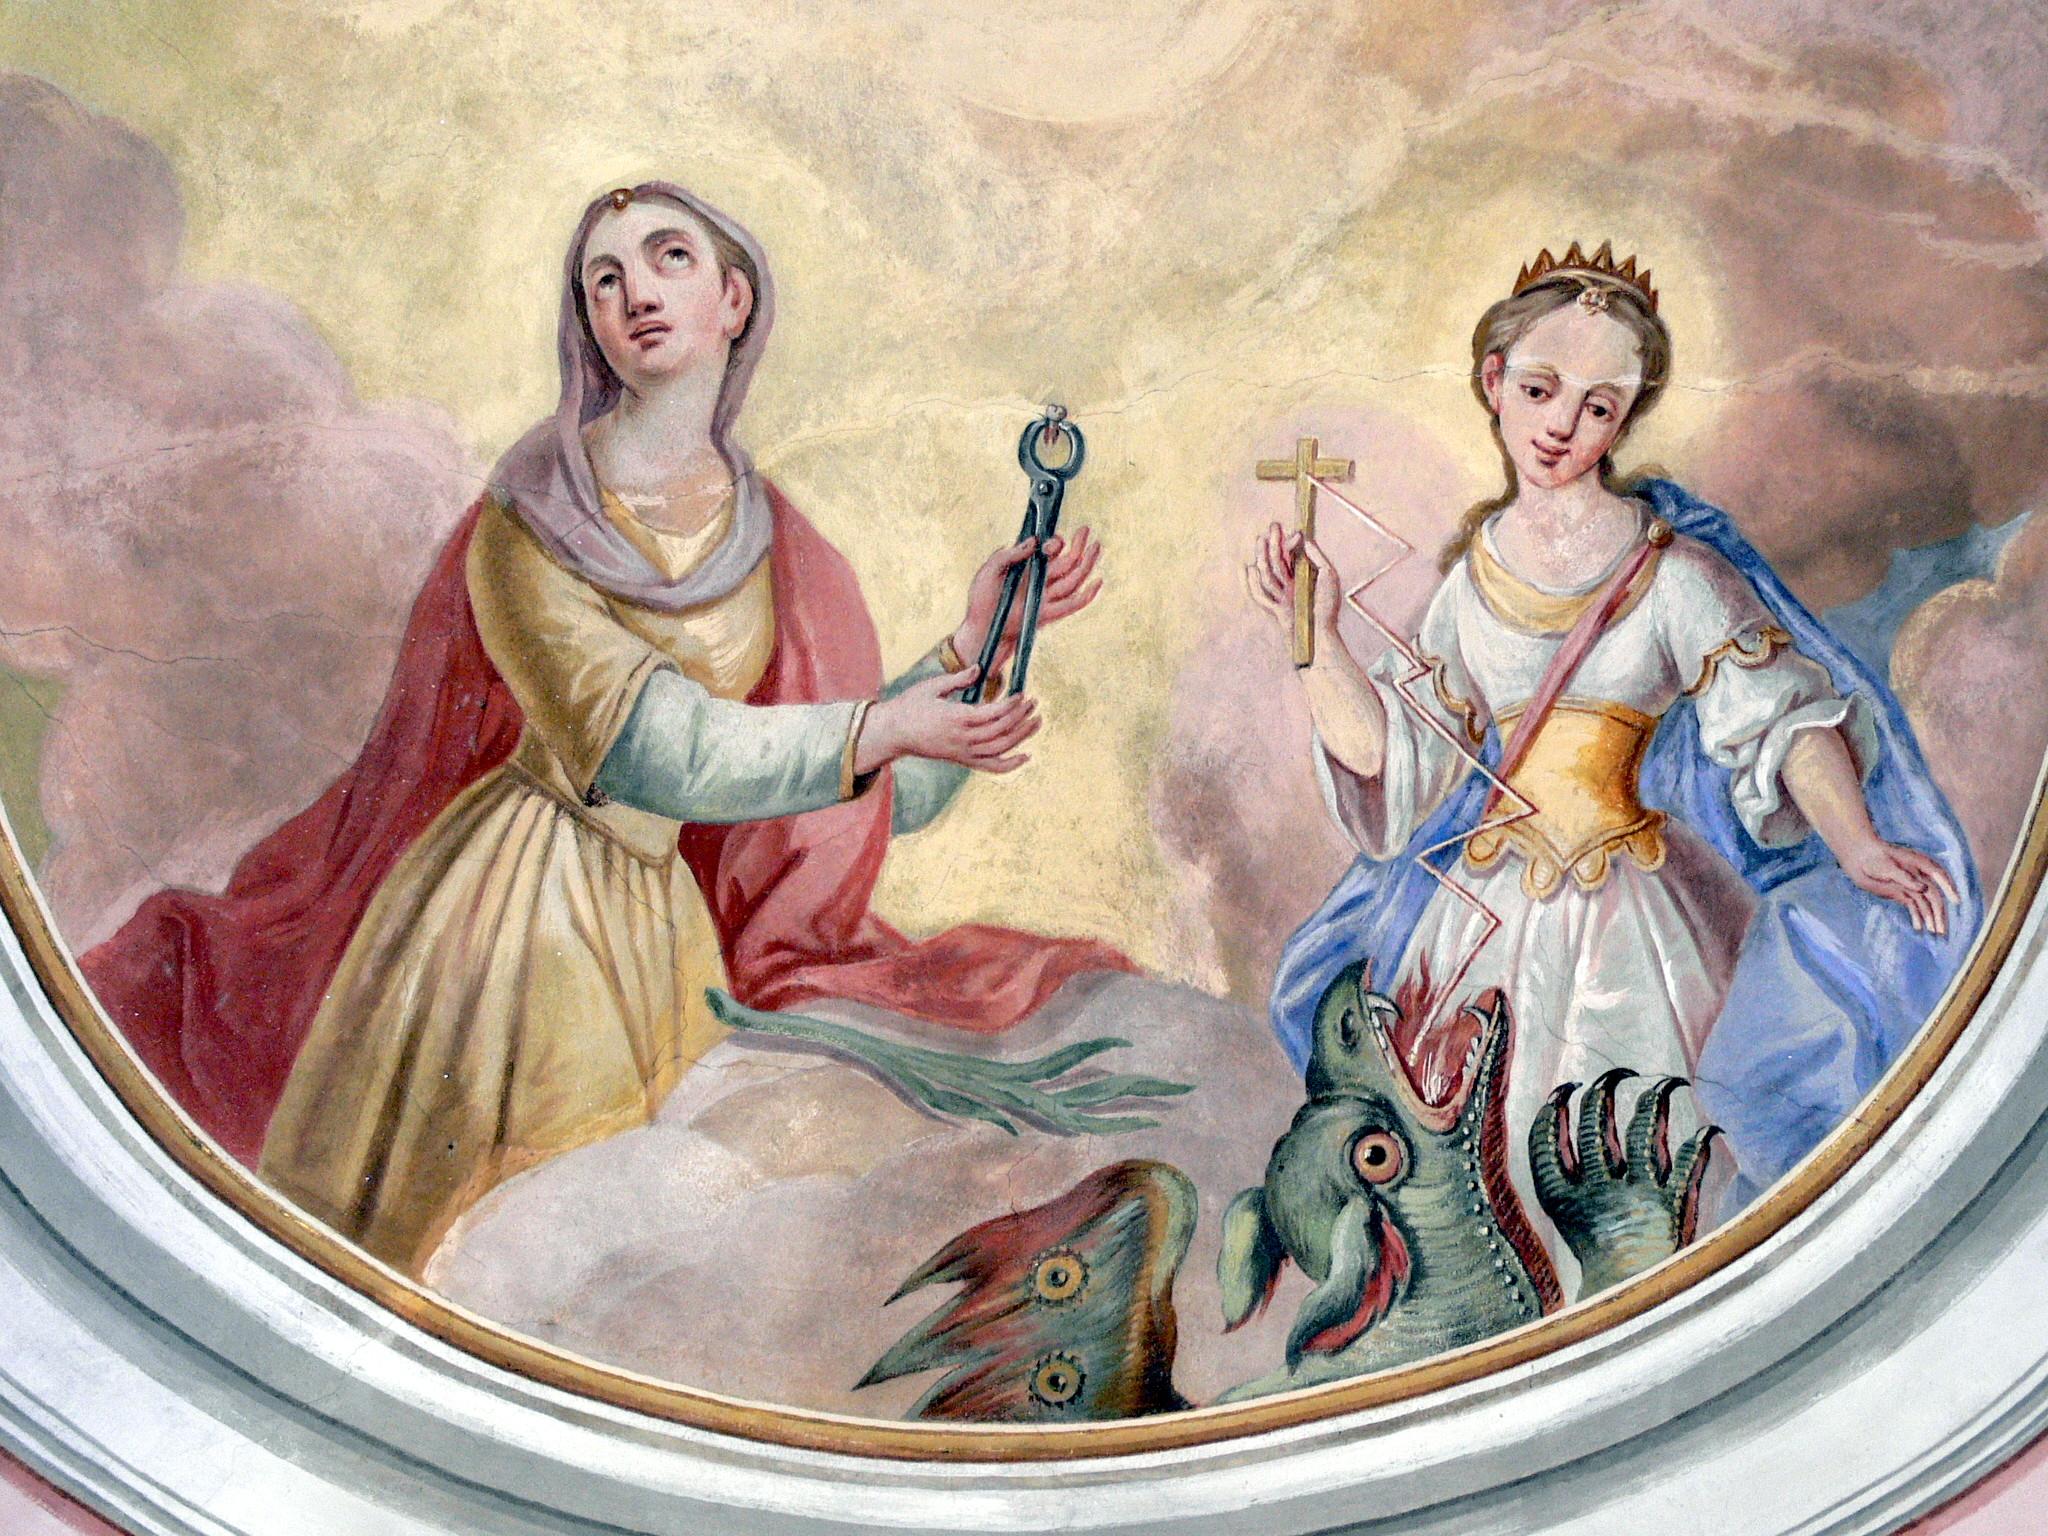 [Image: Stadtkirche_Fresco-_Apollonia_und_Margarete.jpg]